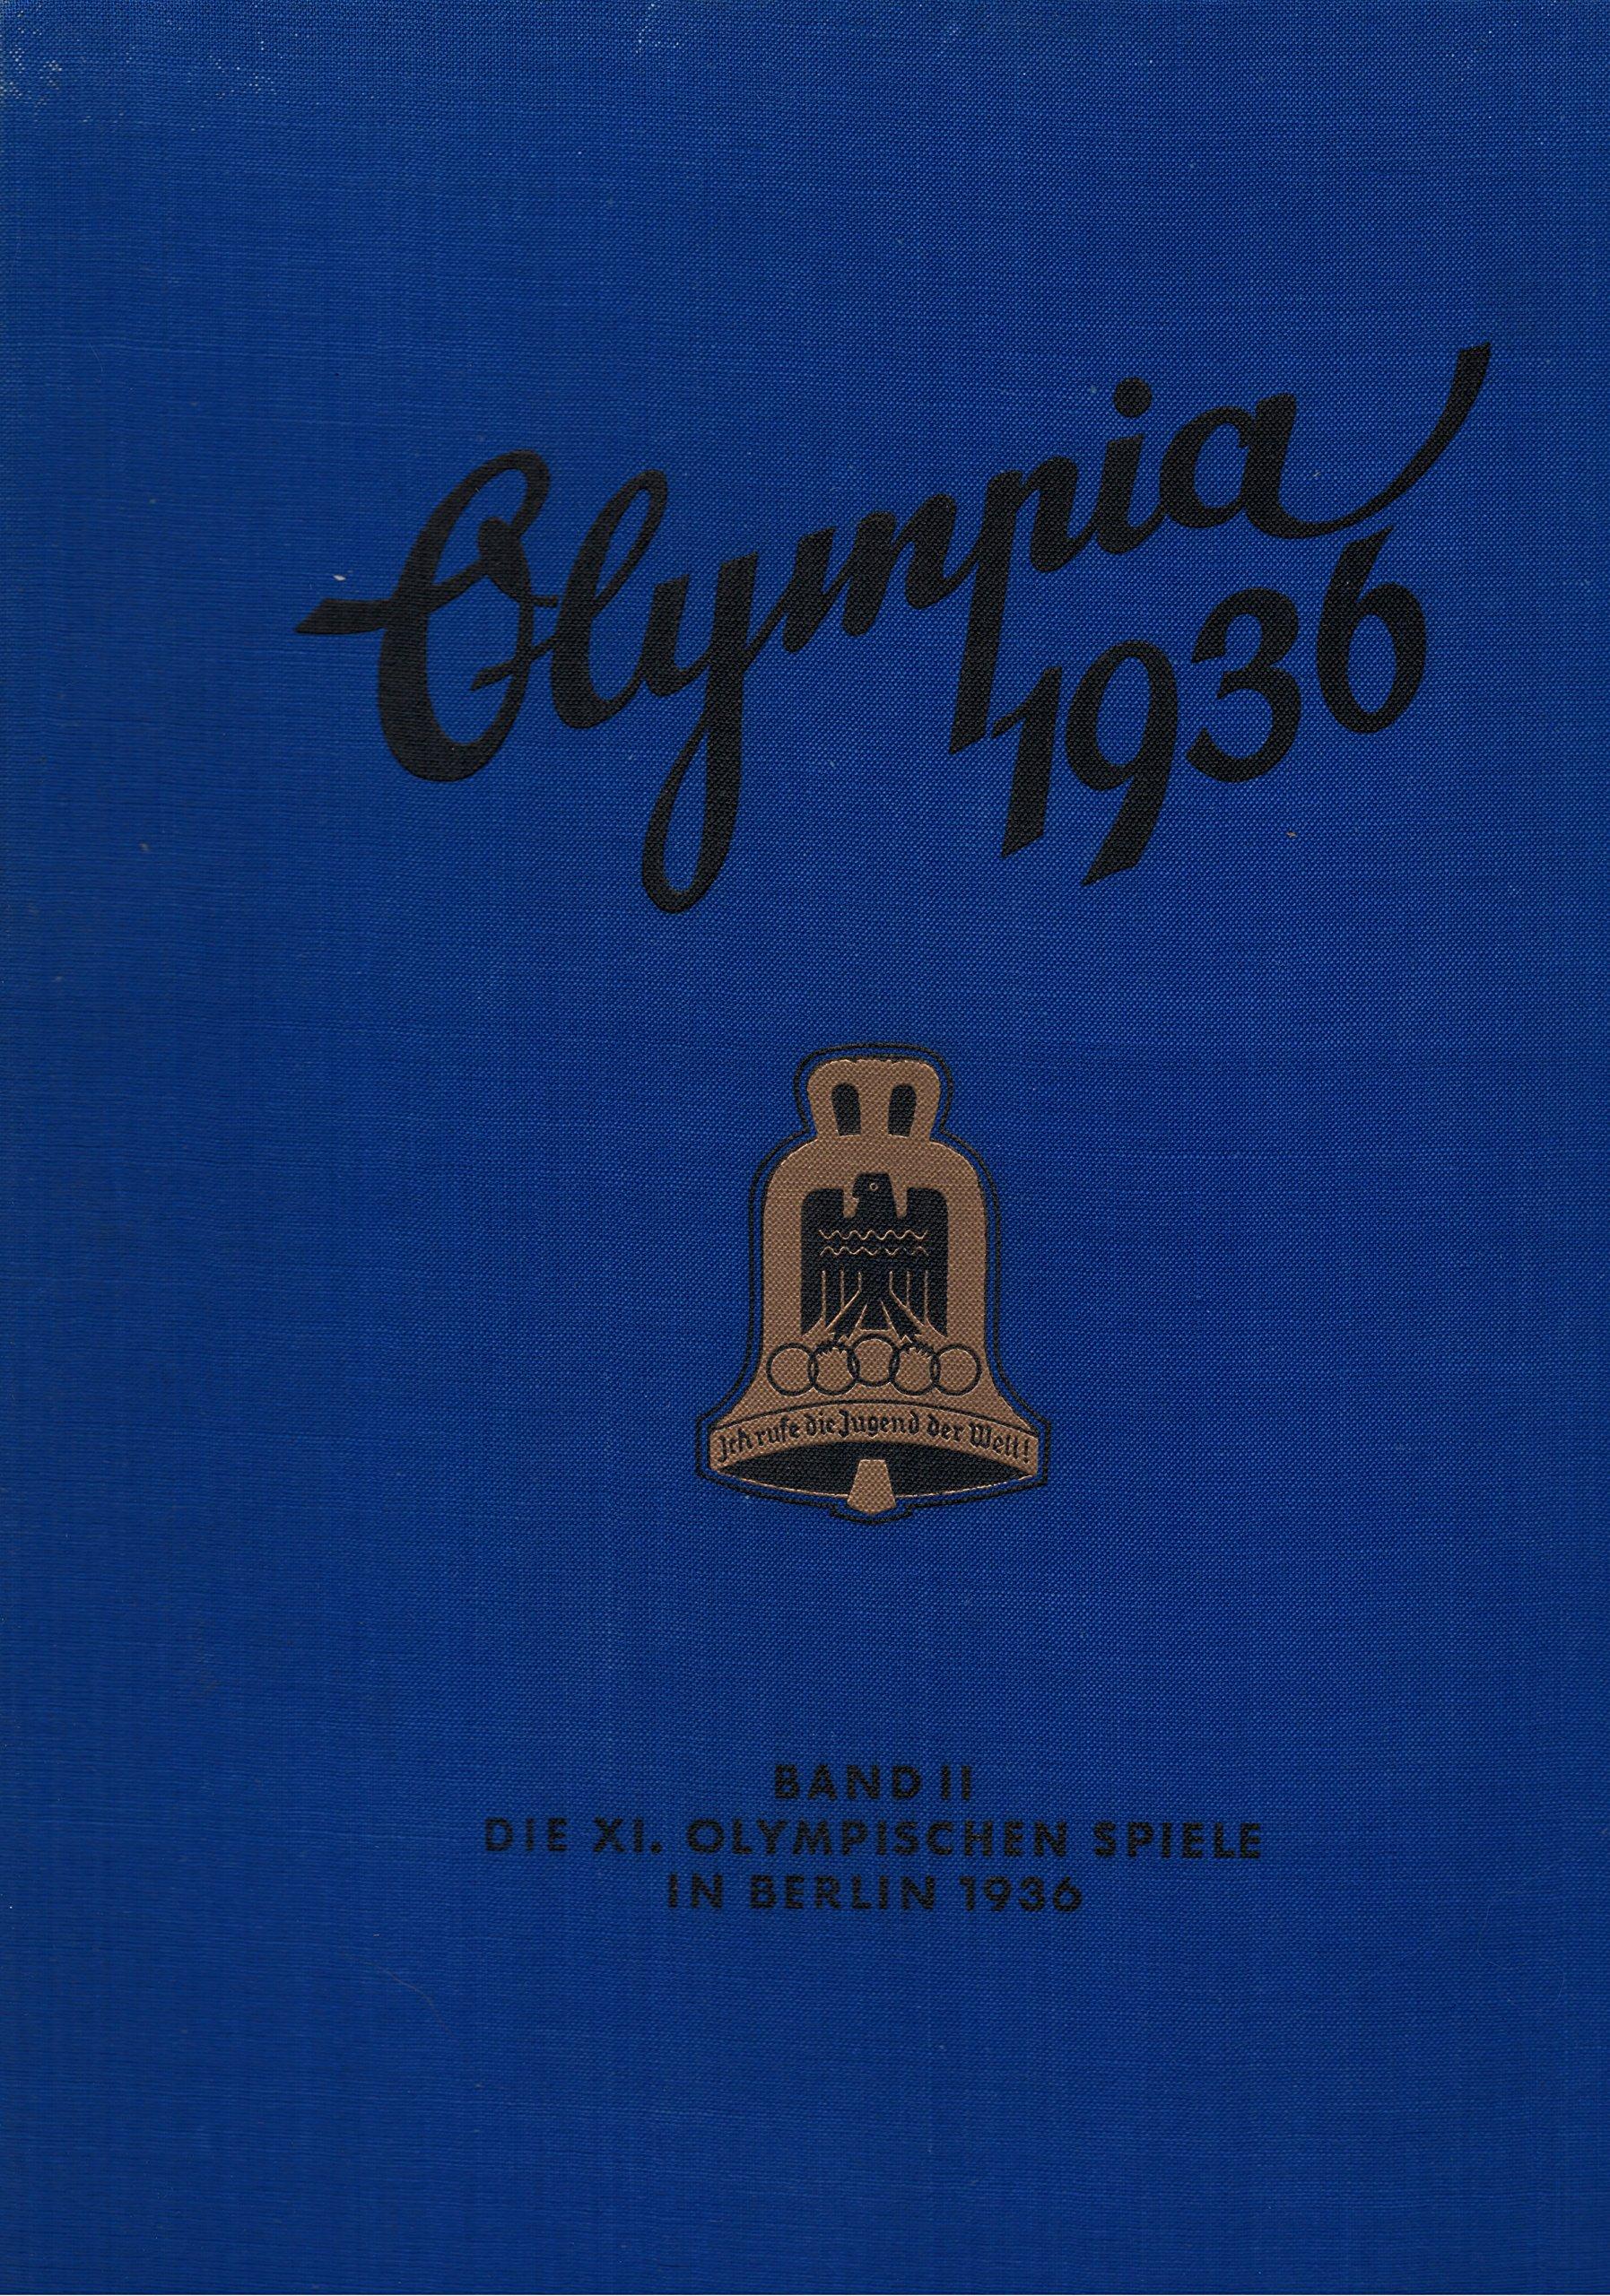 Olympia 1936 Book 2 Die Olympischen Spiele 1936 Band Ii Cigaretten Bilderdienst Altona Bahrenfeld Amazon Com Books